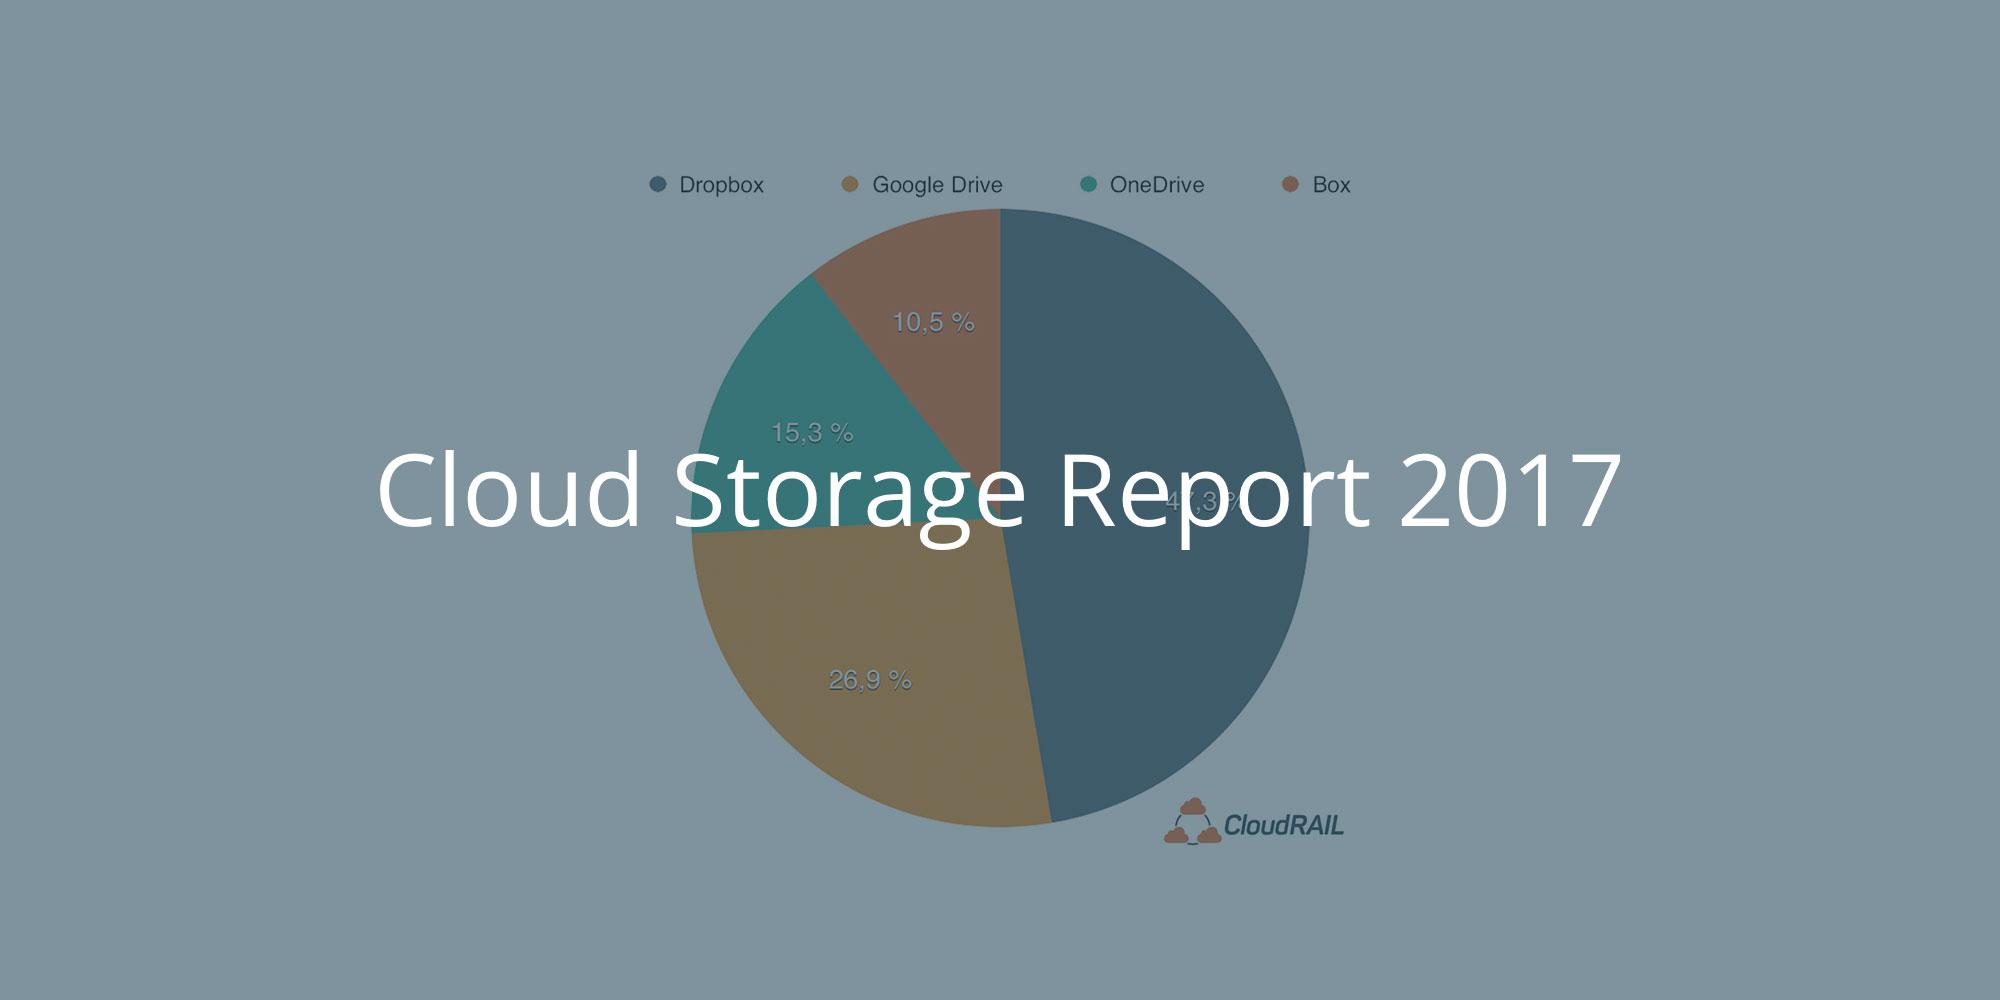 Cloud Storage Report 2017 - Dropbox Loses Market Share But